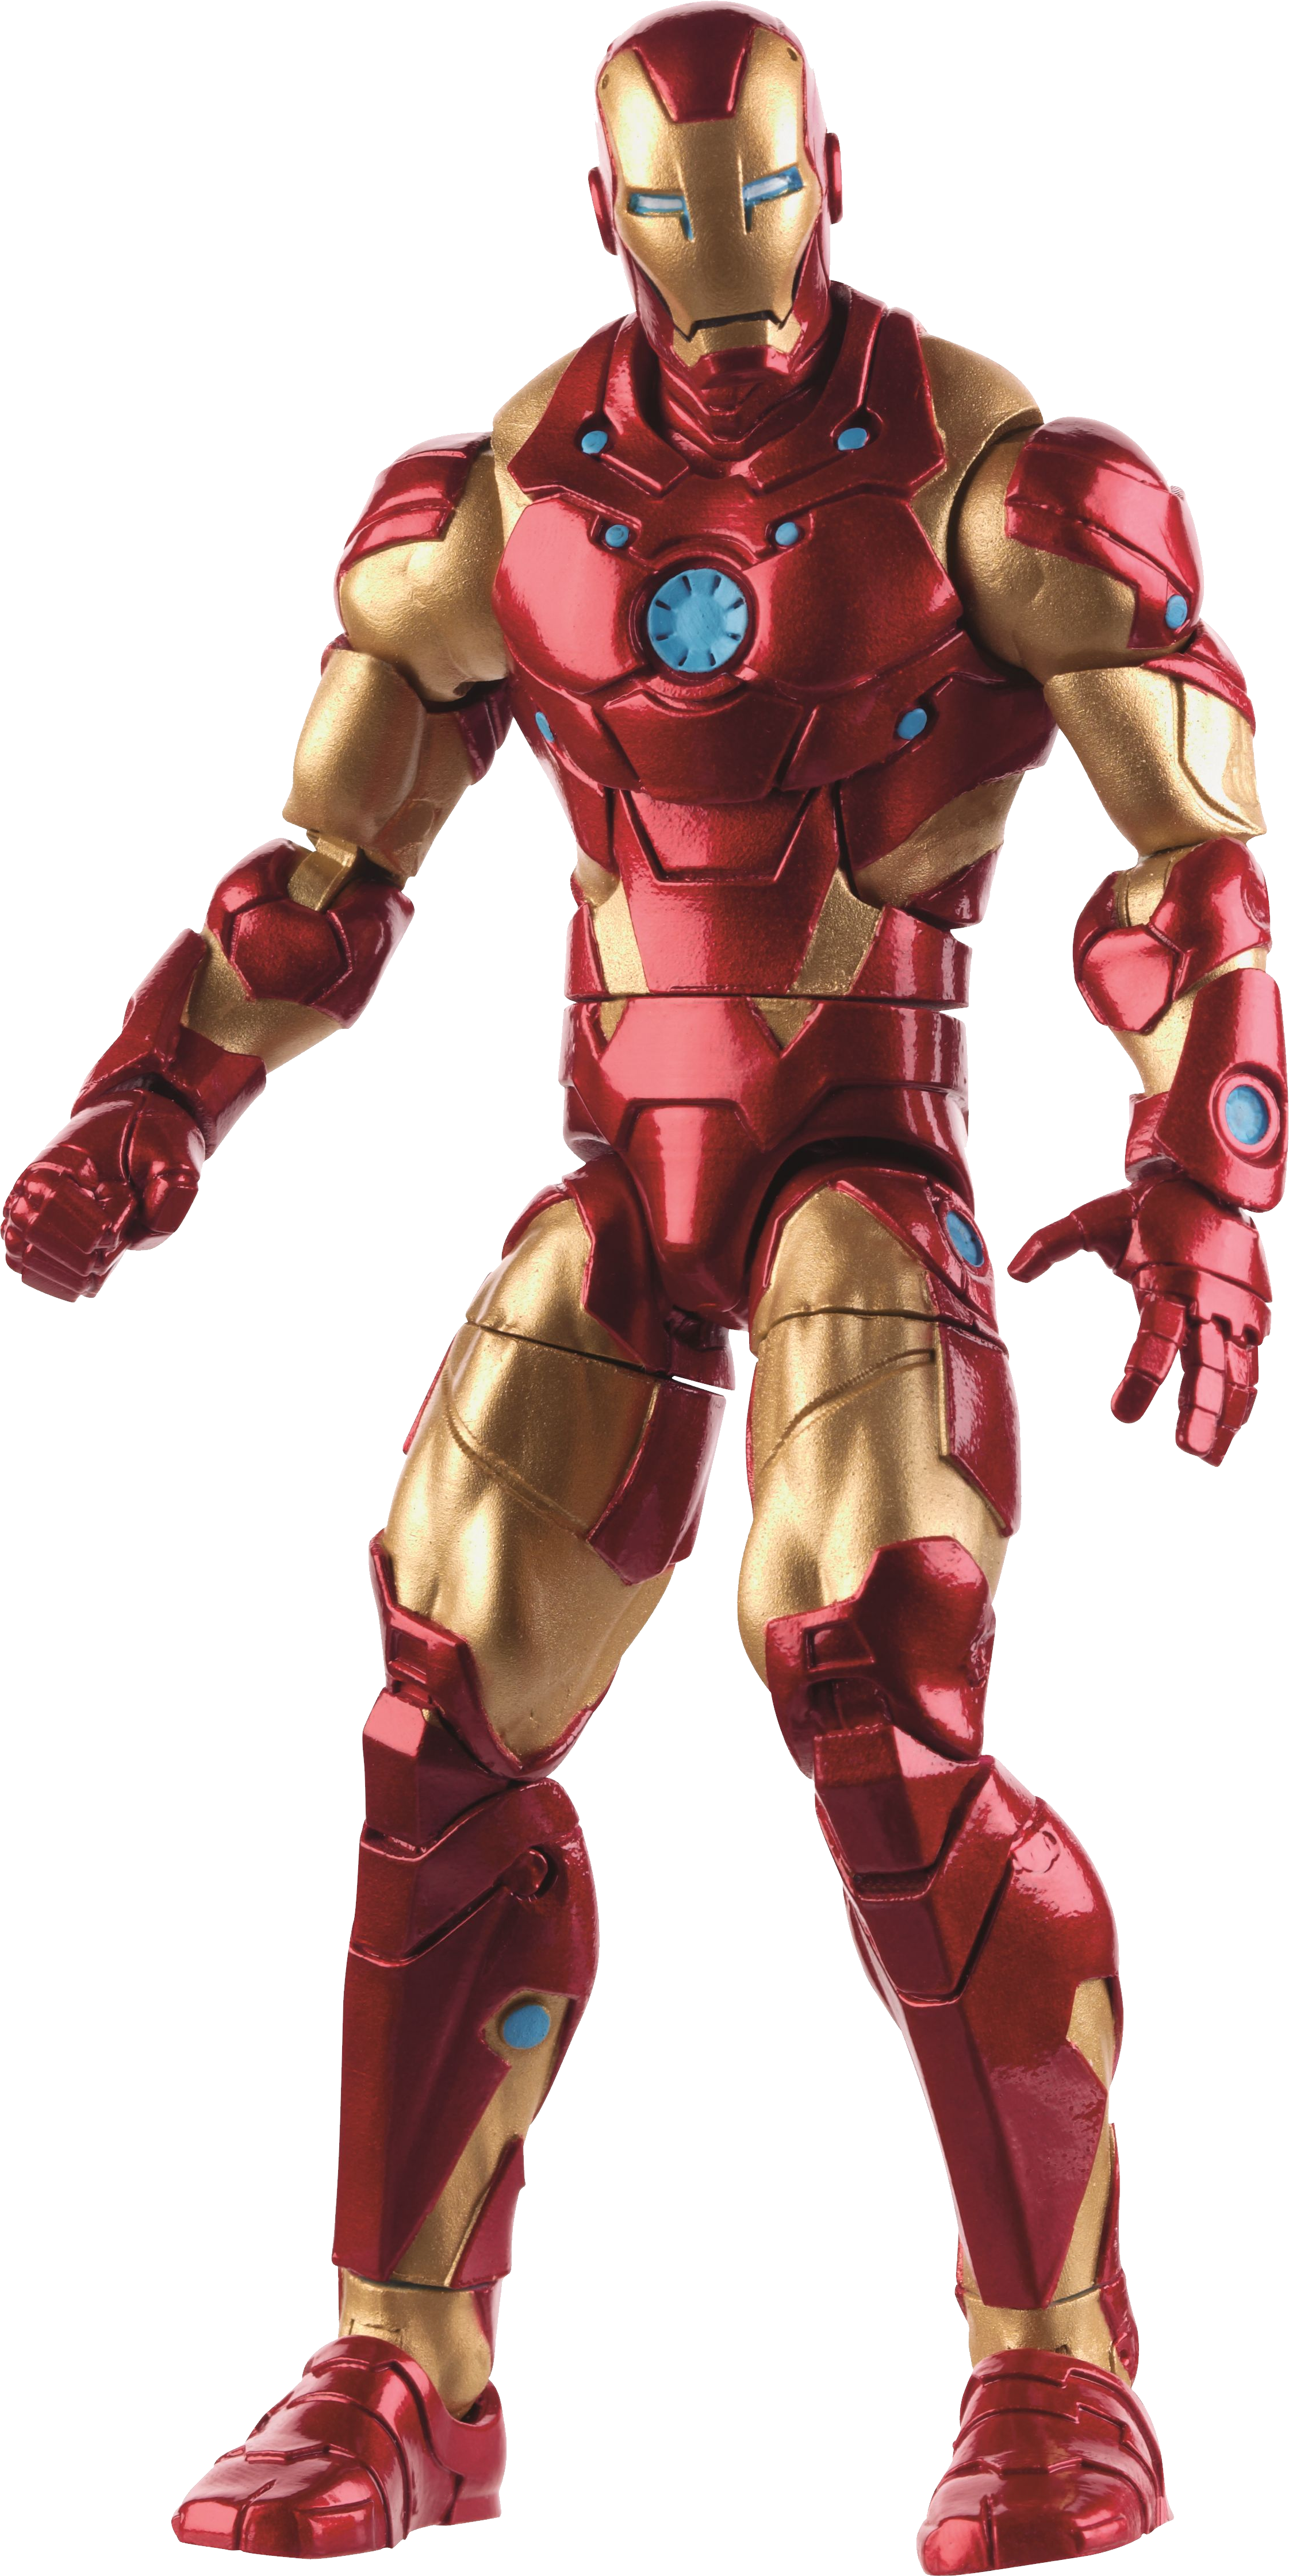 Ironman PNG Image Iron man, Marvel legends figures